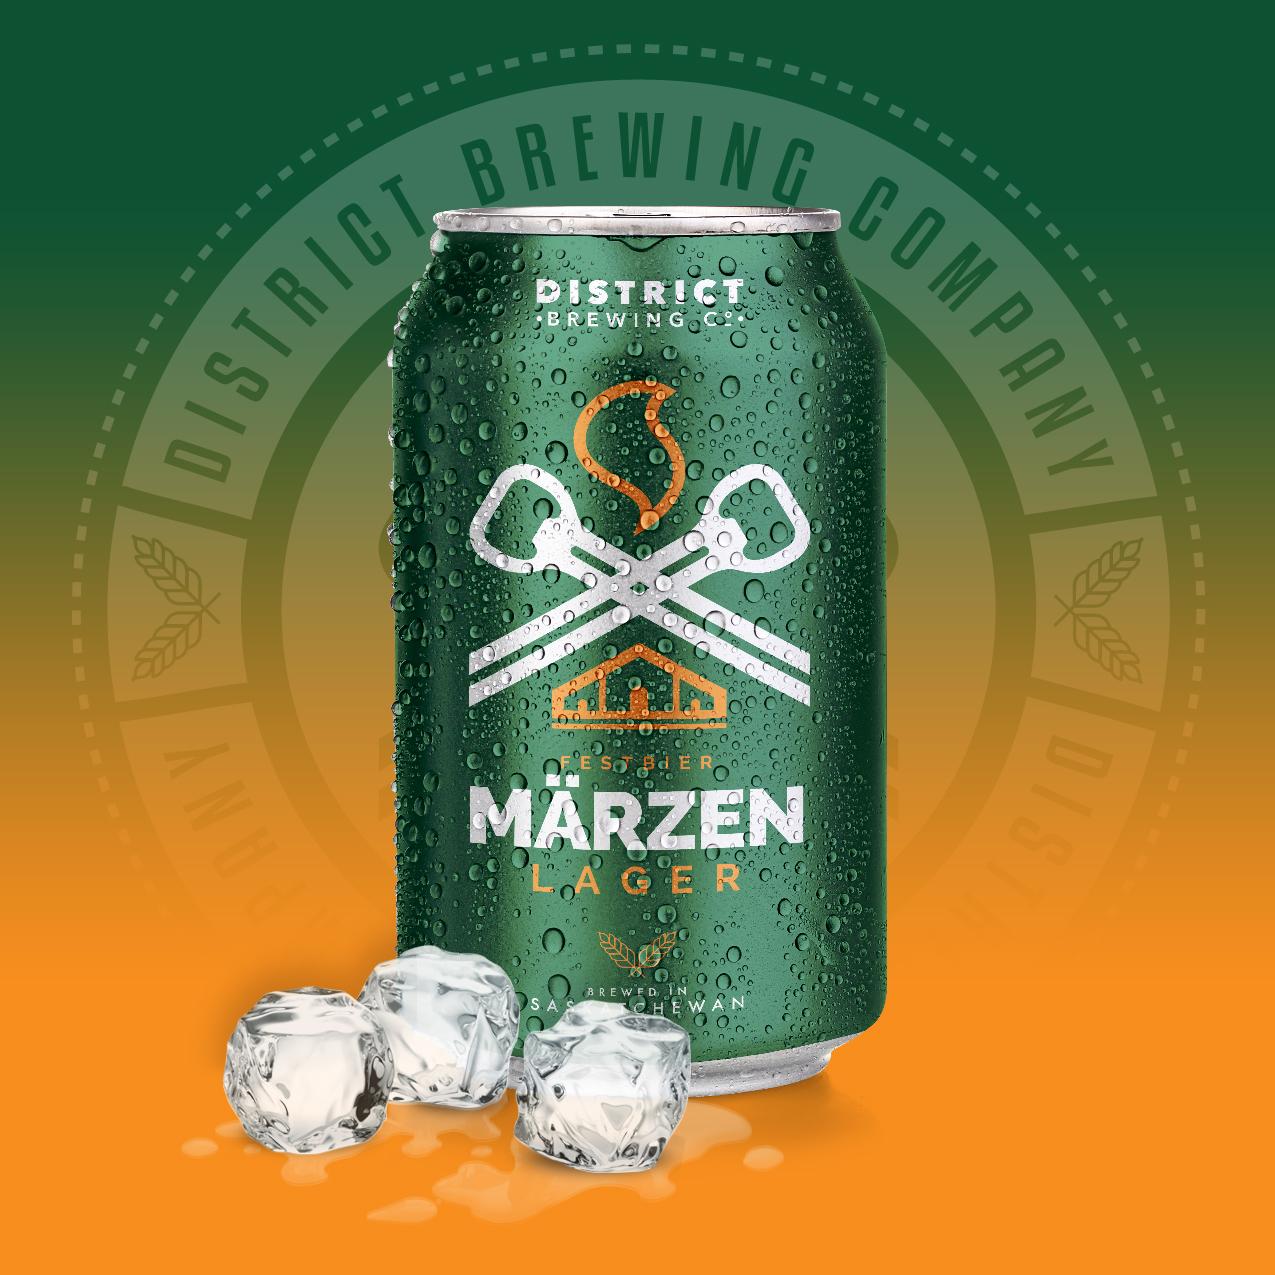 Festbier Marzen Distrcit Brewing Company Craft Beer